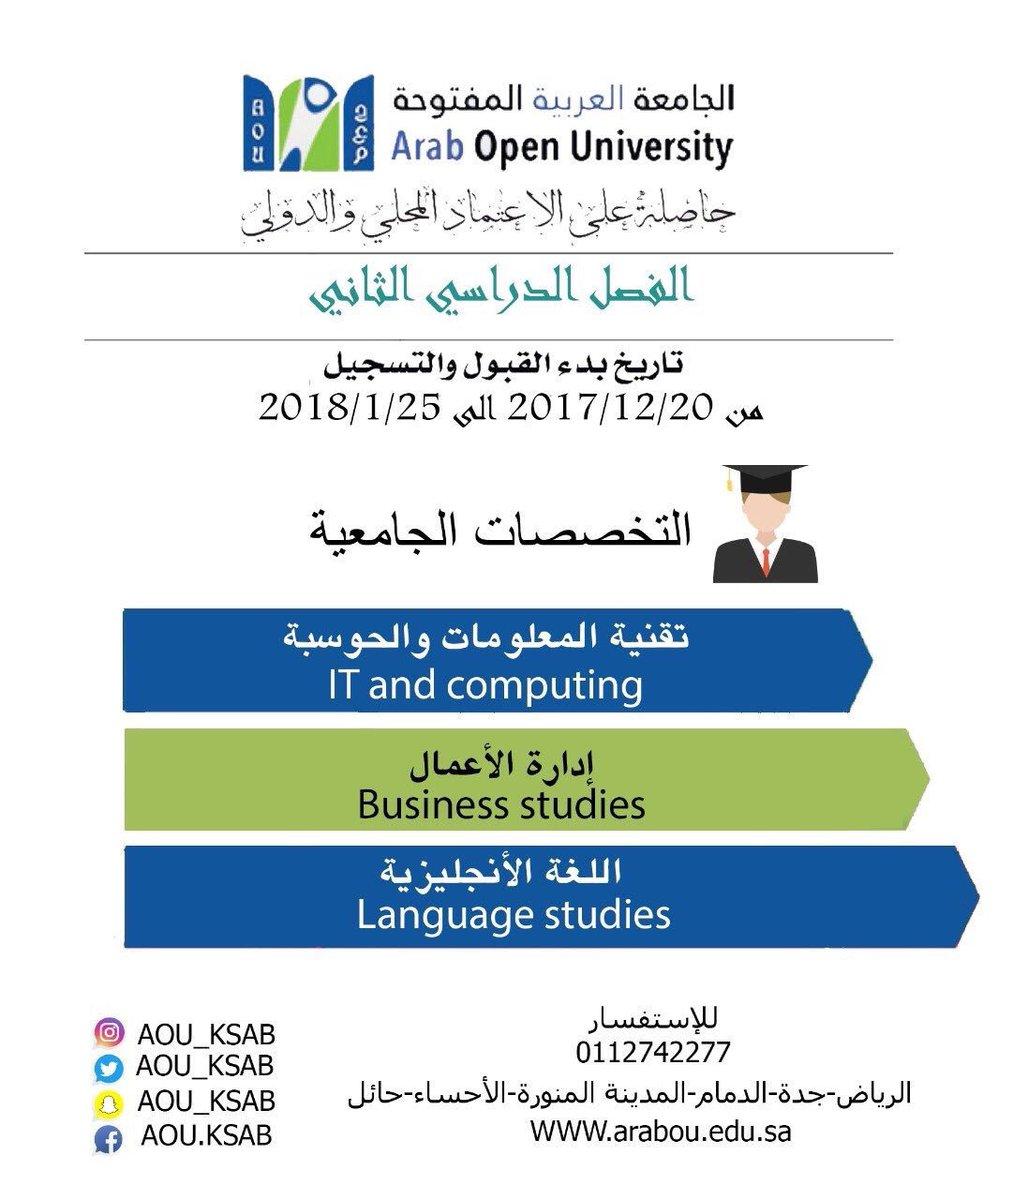 O Xrhsths الجامعة العربية المفتوحة Sto Twitter سداد رسوم التسجيل الدراسية عن طريق بنك الرياض